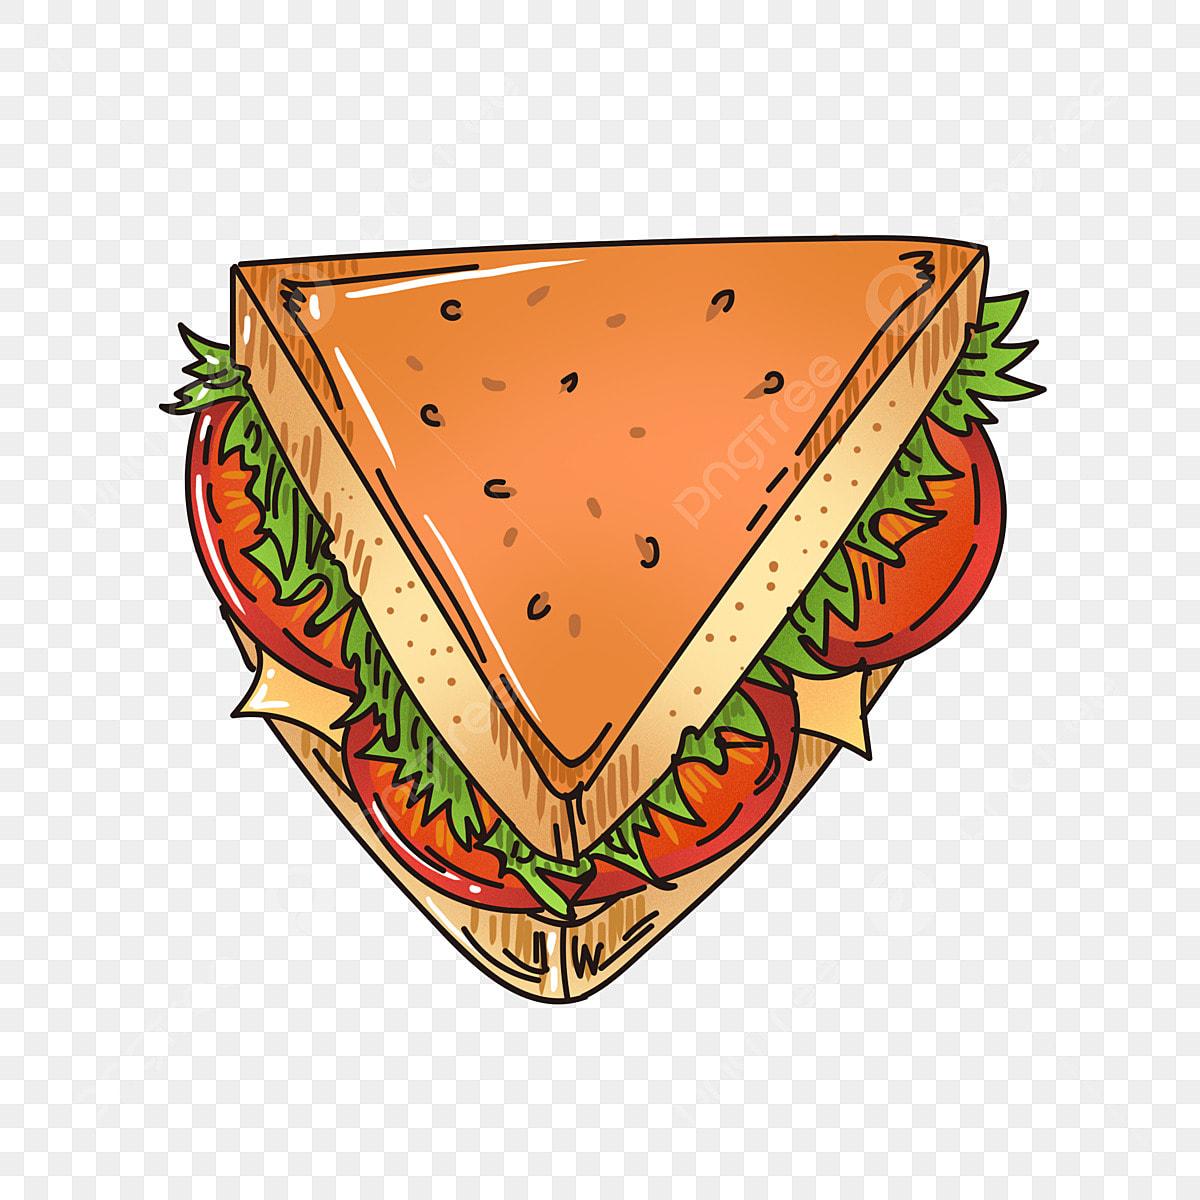 Western Sandwich Sandwich Clipart Sandwich Snacks Snacks Snacks